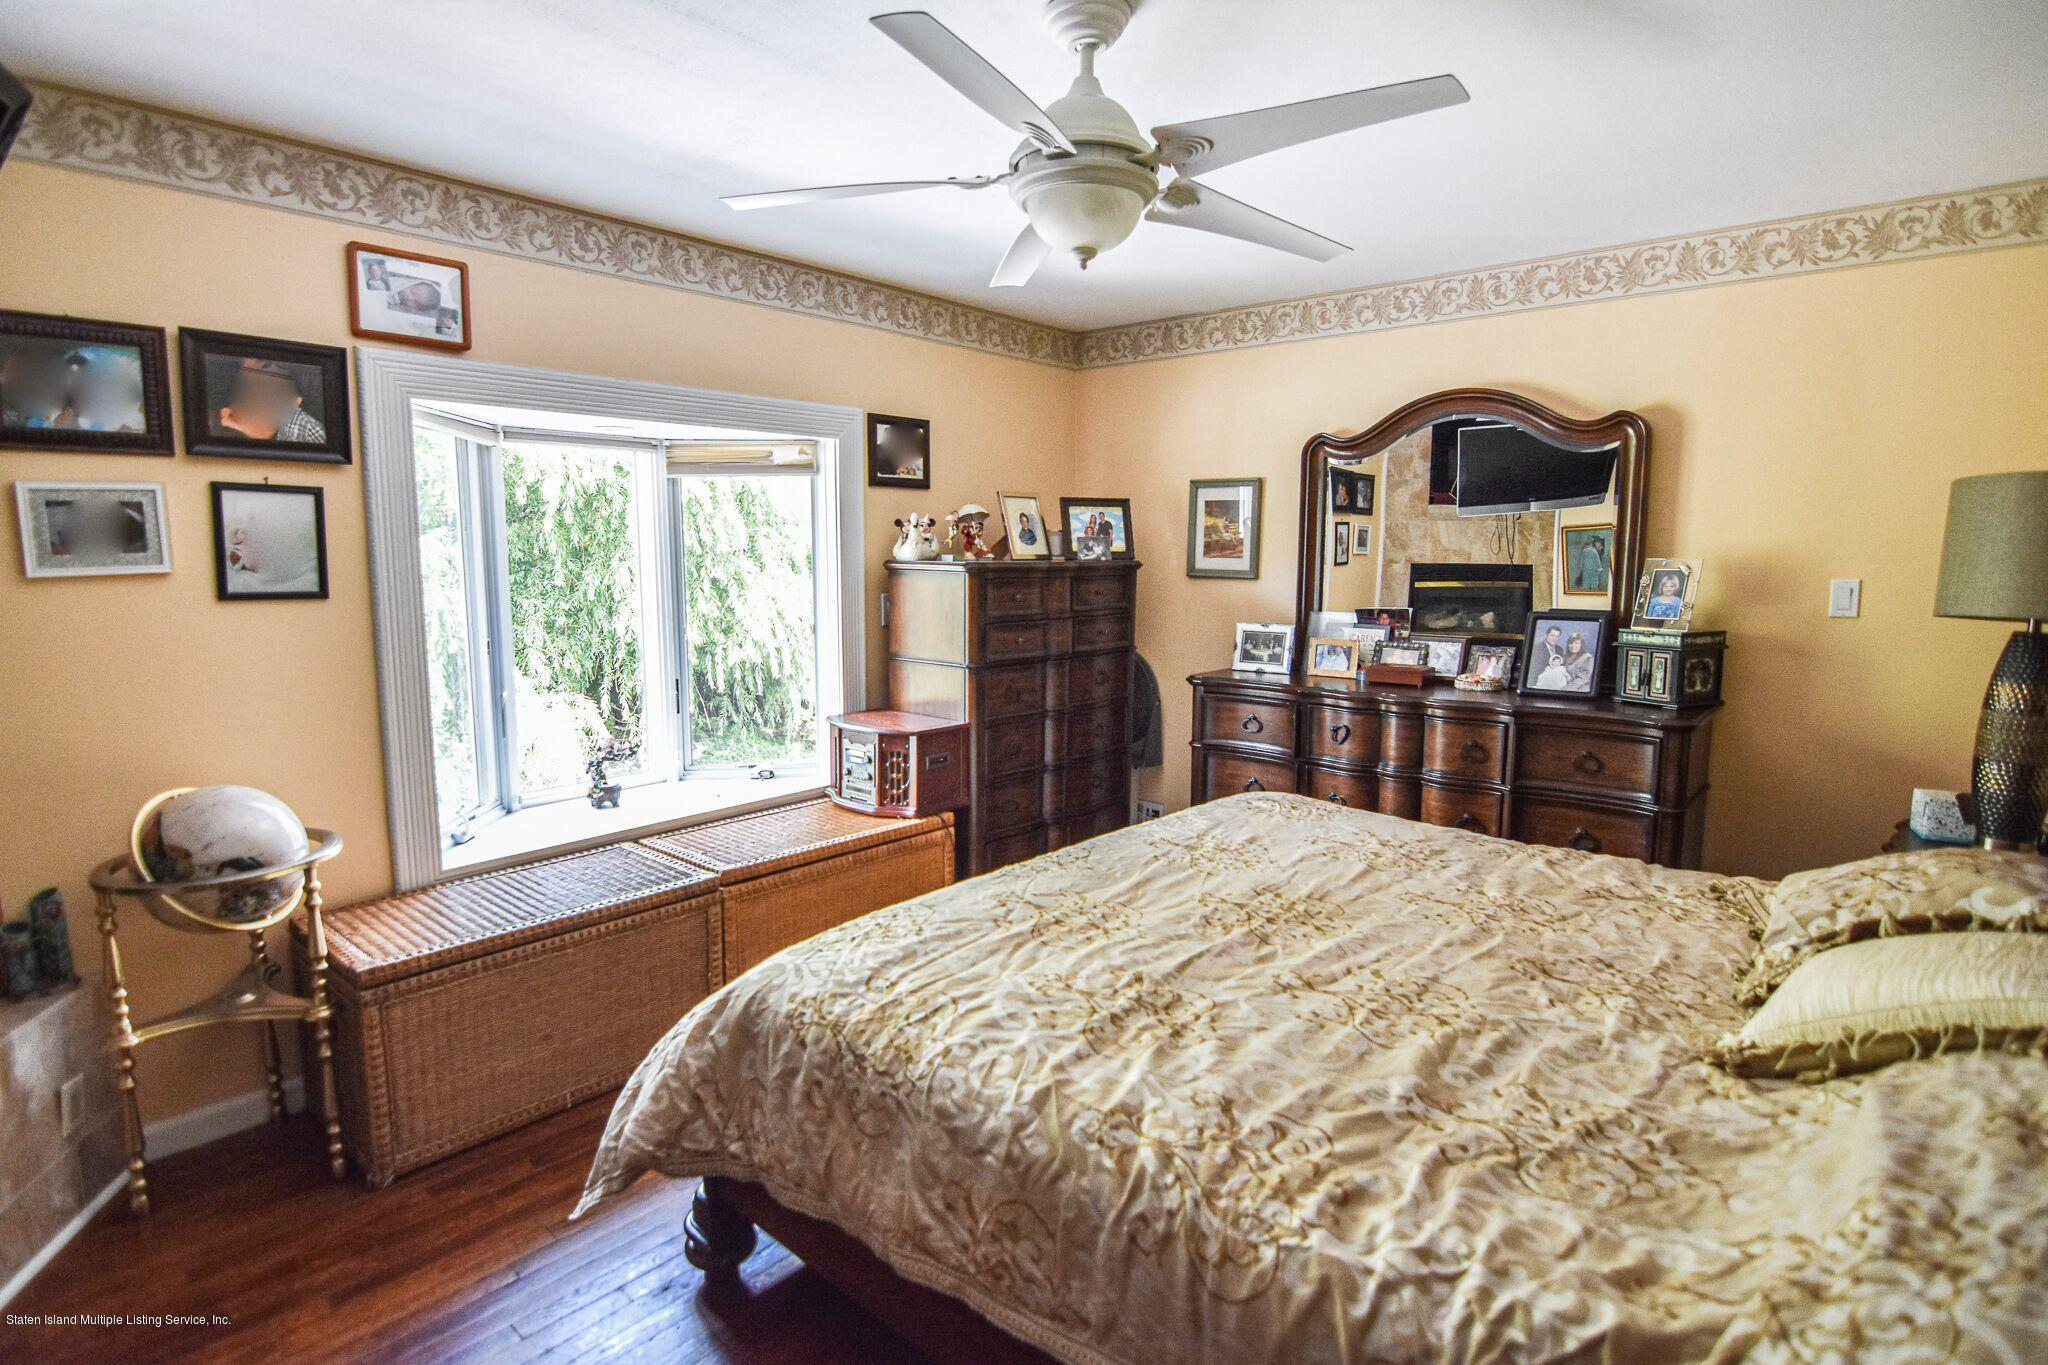 Two Family - Detached 3 Fieldstone Road  Staten Island, NY 10314, MLS-1131141-24